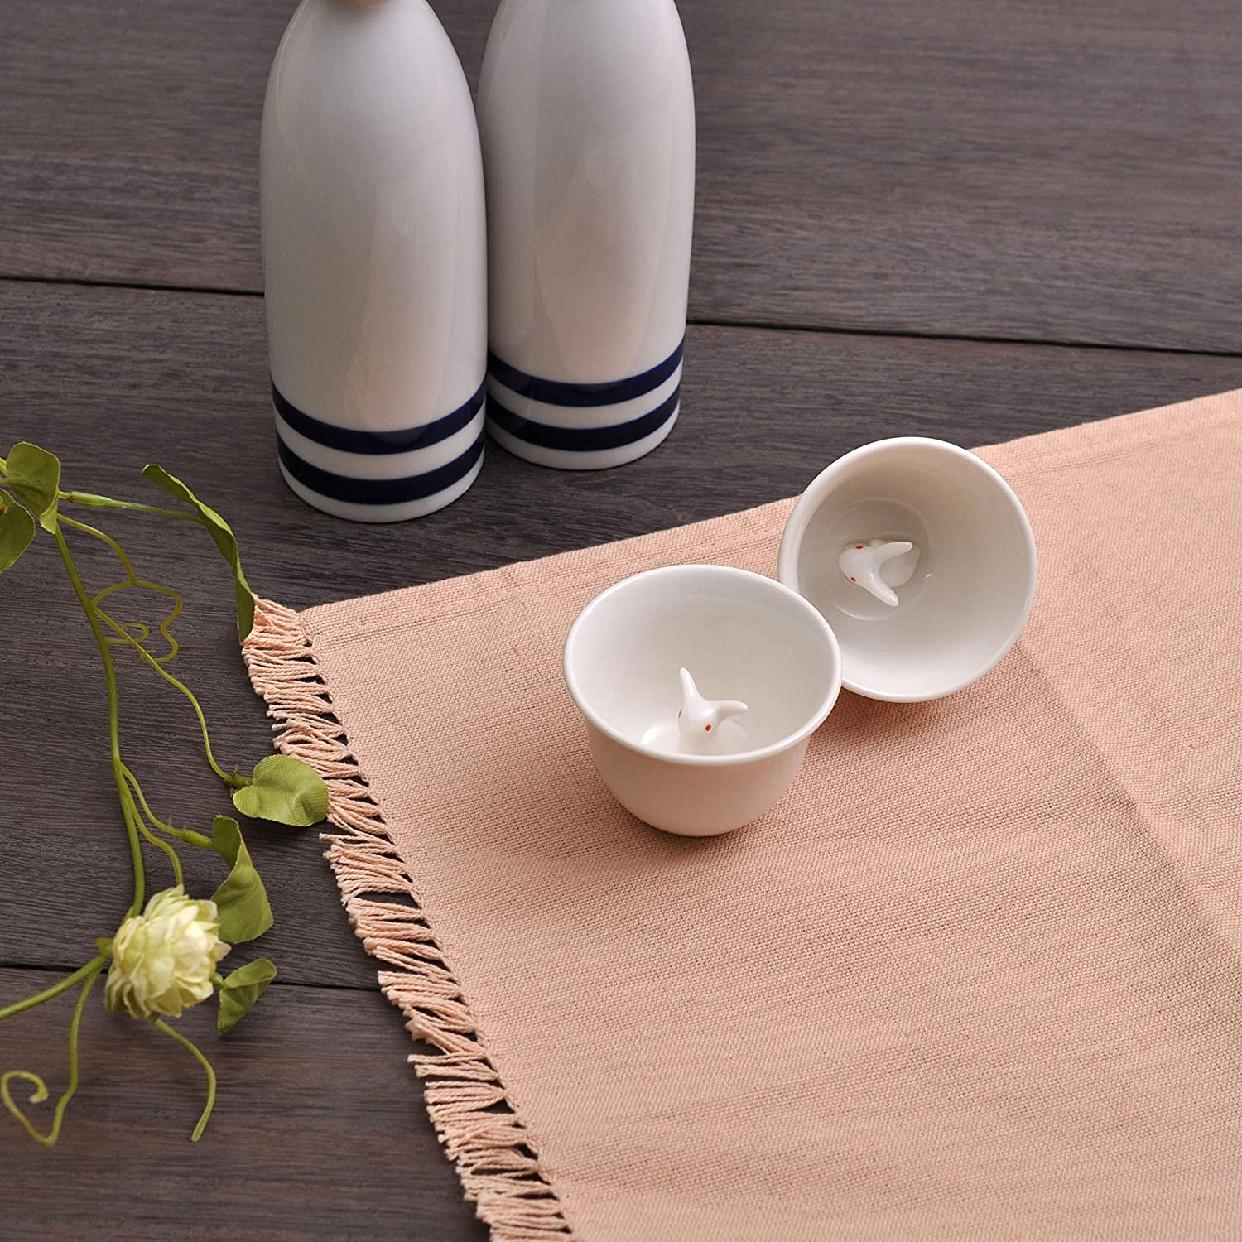 bloom(ブルーム)美濃焼 ミニうさぎ ペア おちょこ セットの商品画像5